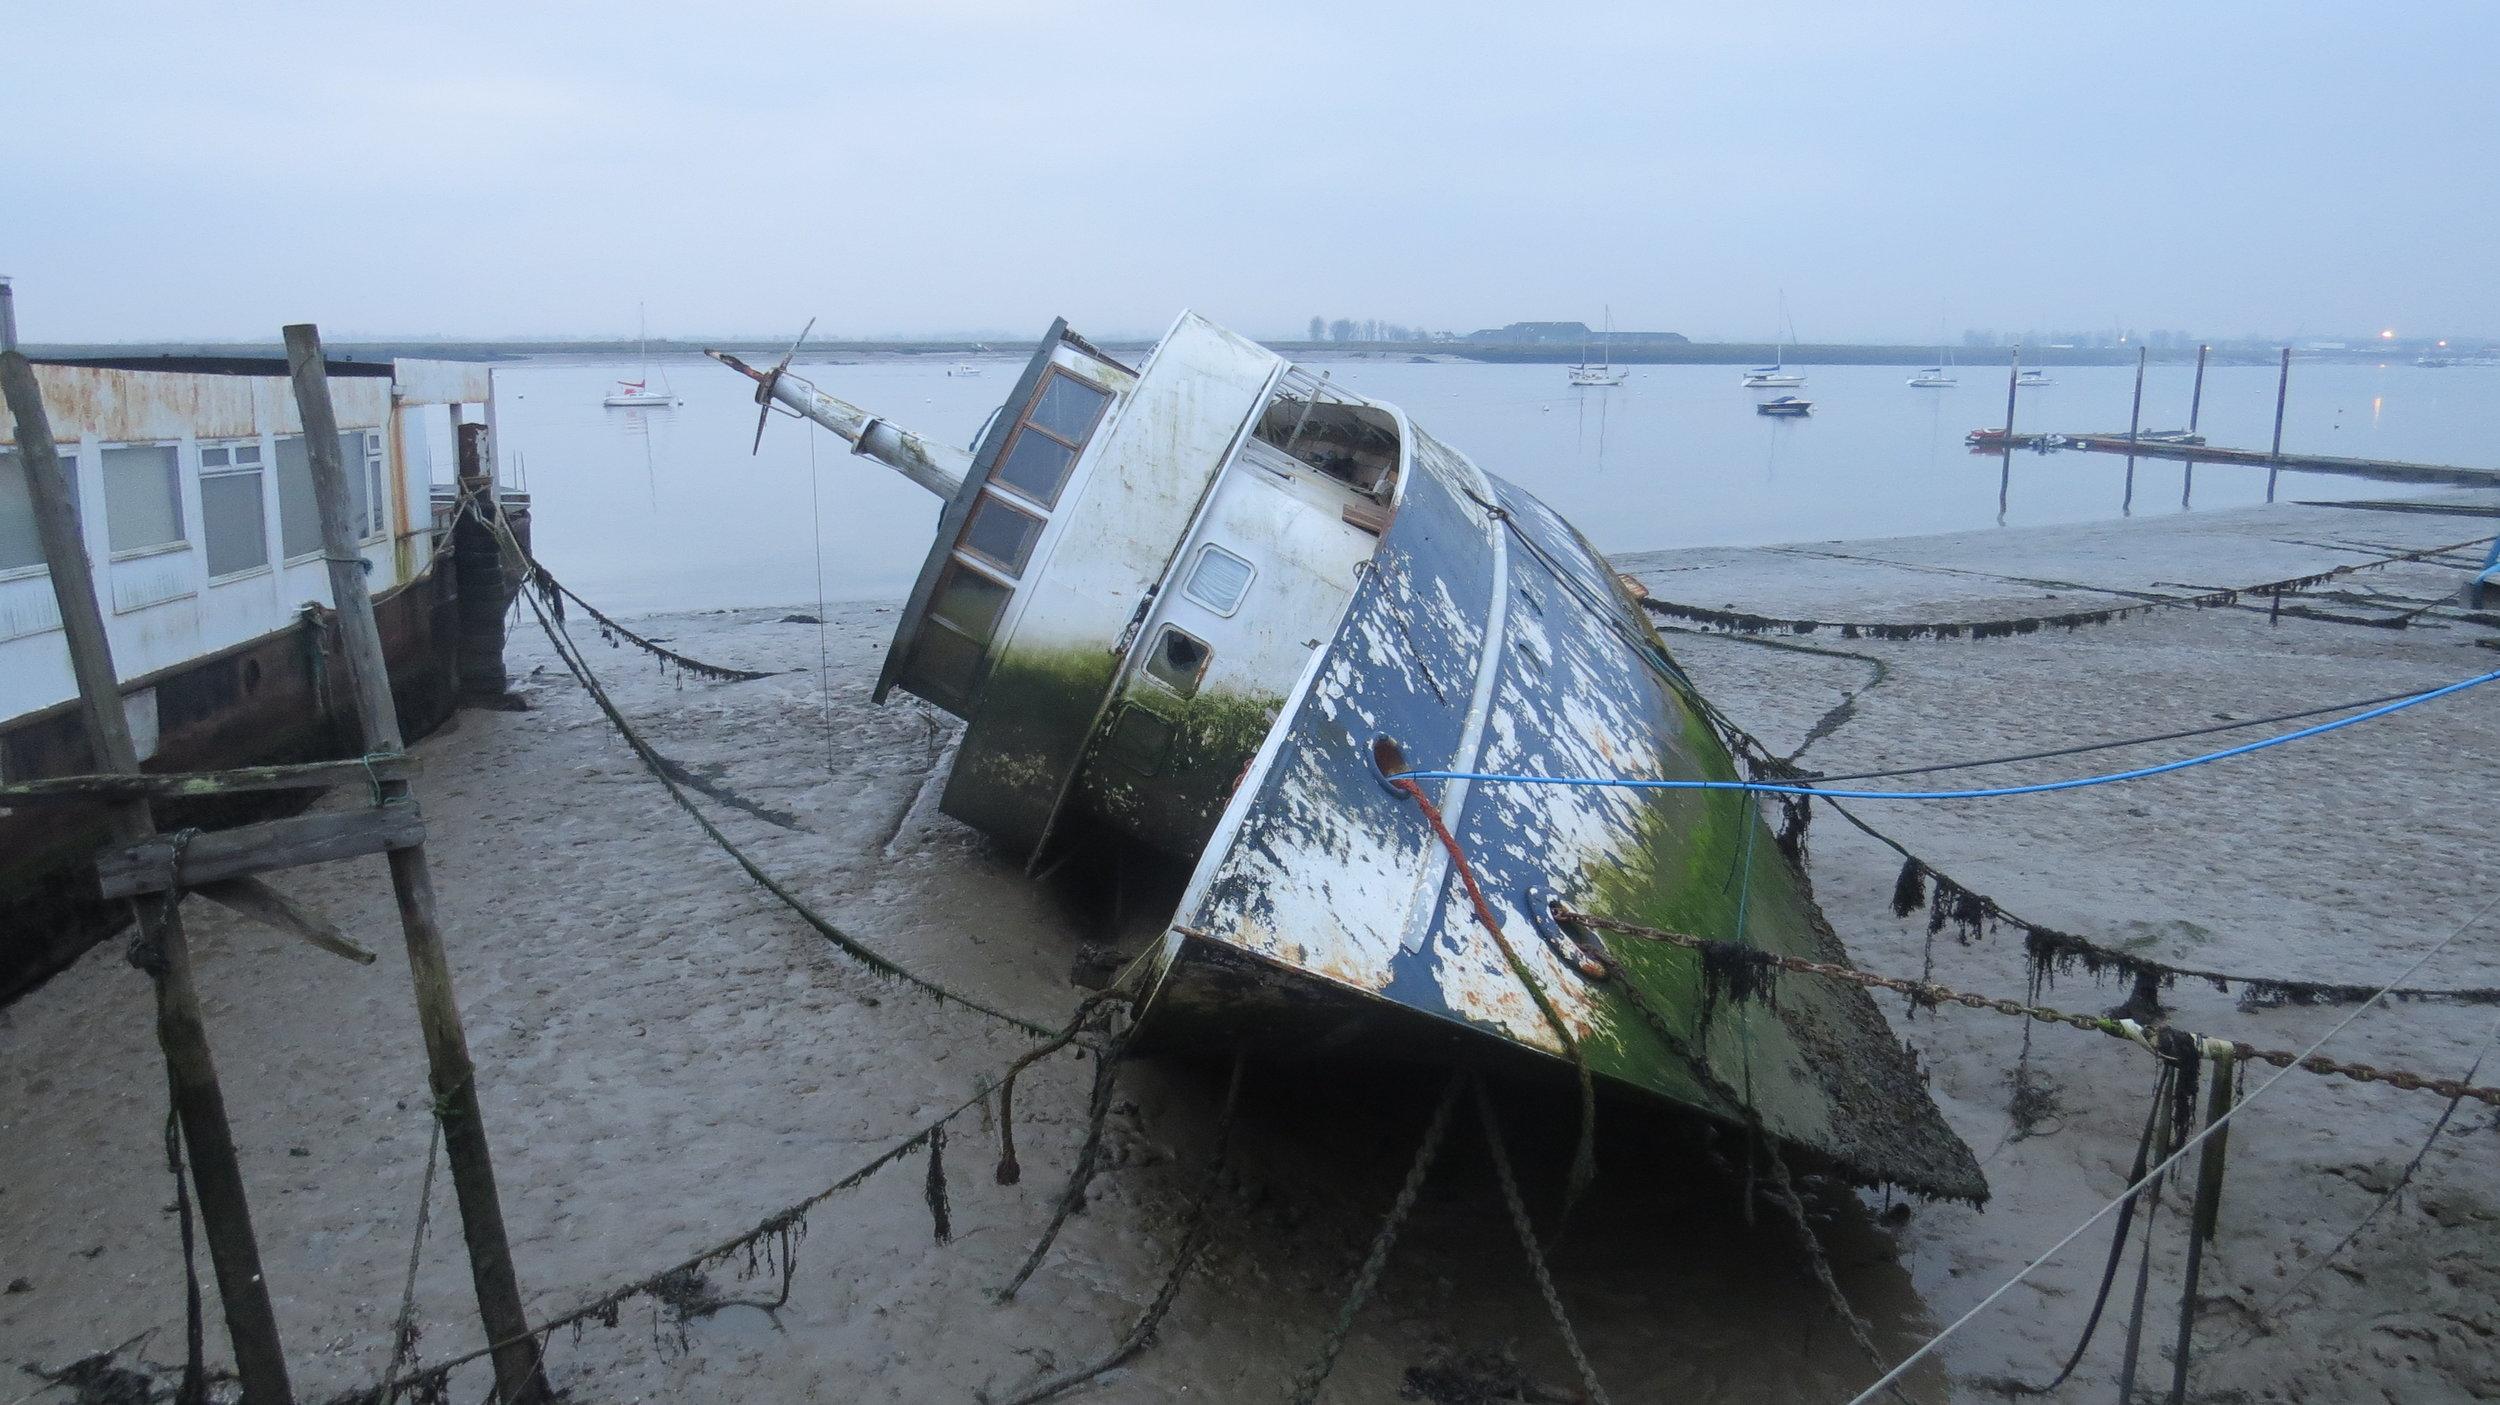 Moored Ship Capsized